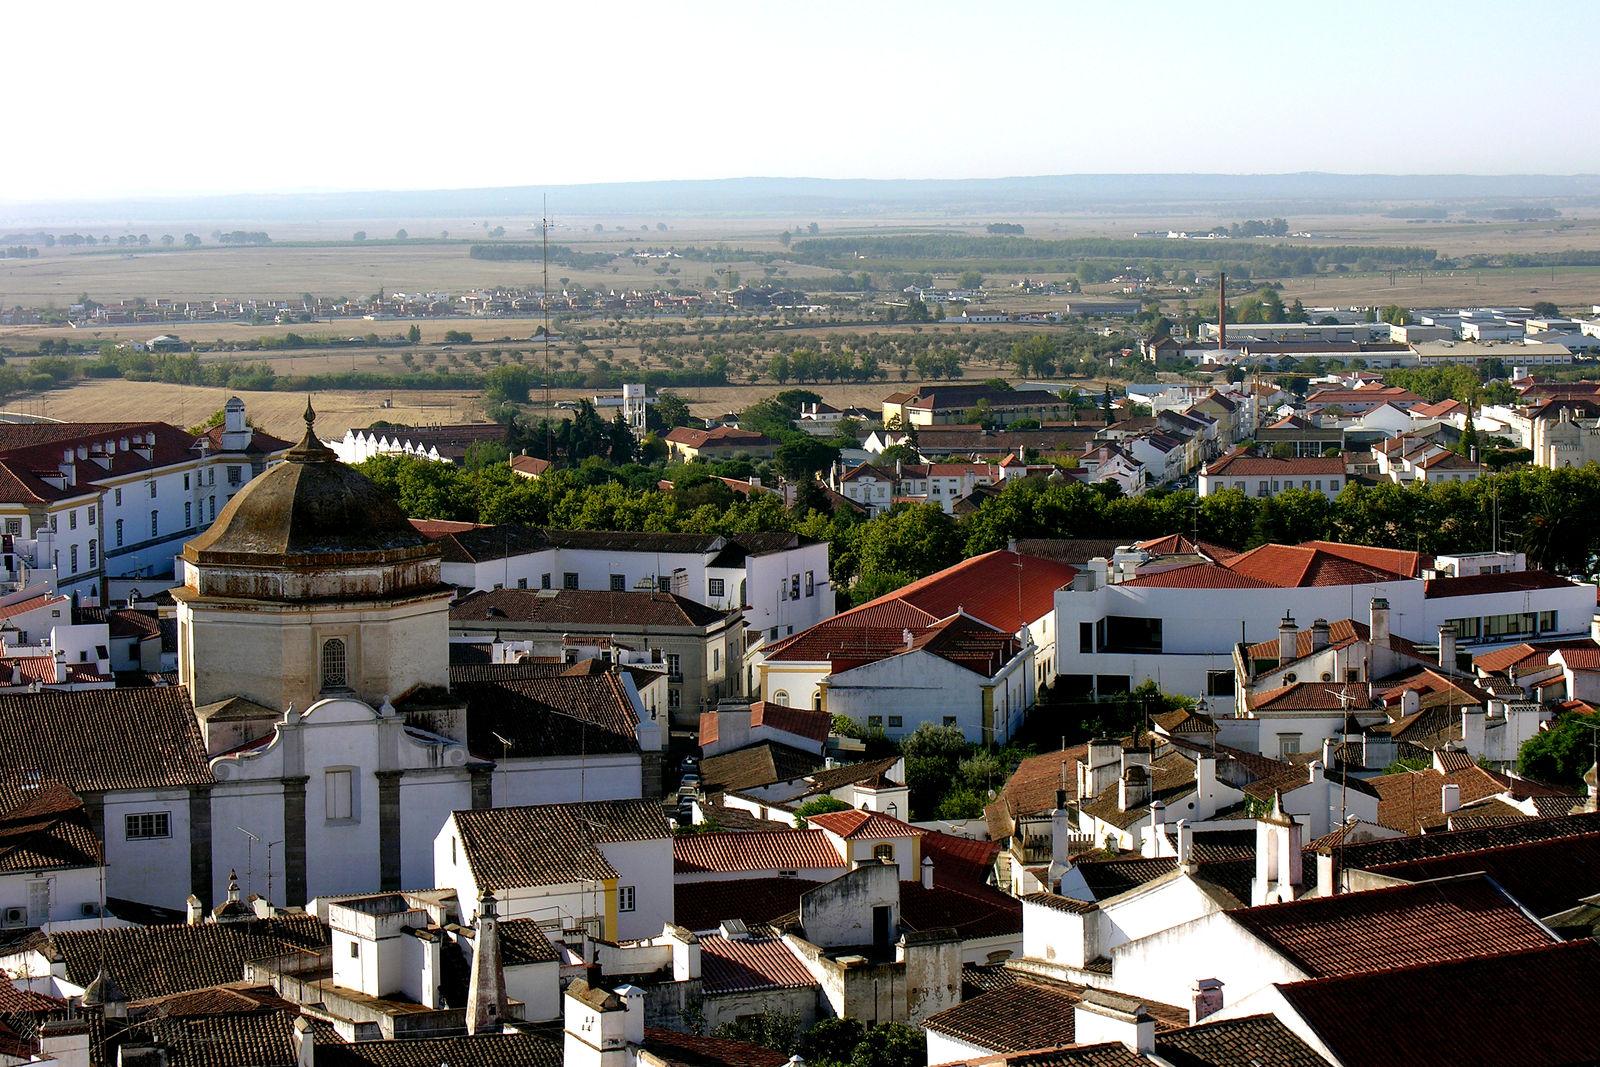 Rondreis Portugal: wat zijn Pousadas? | AmbianceTravel